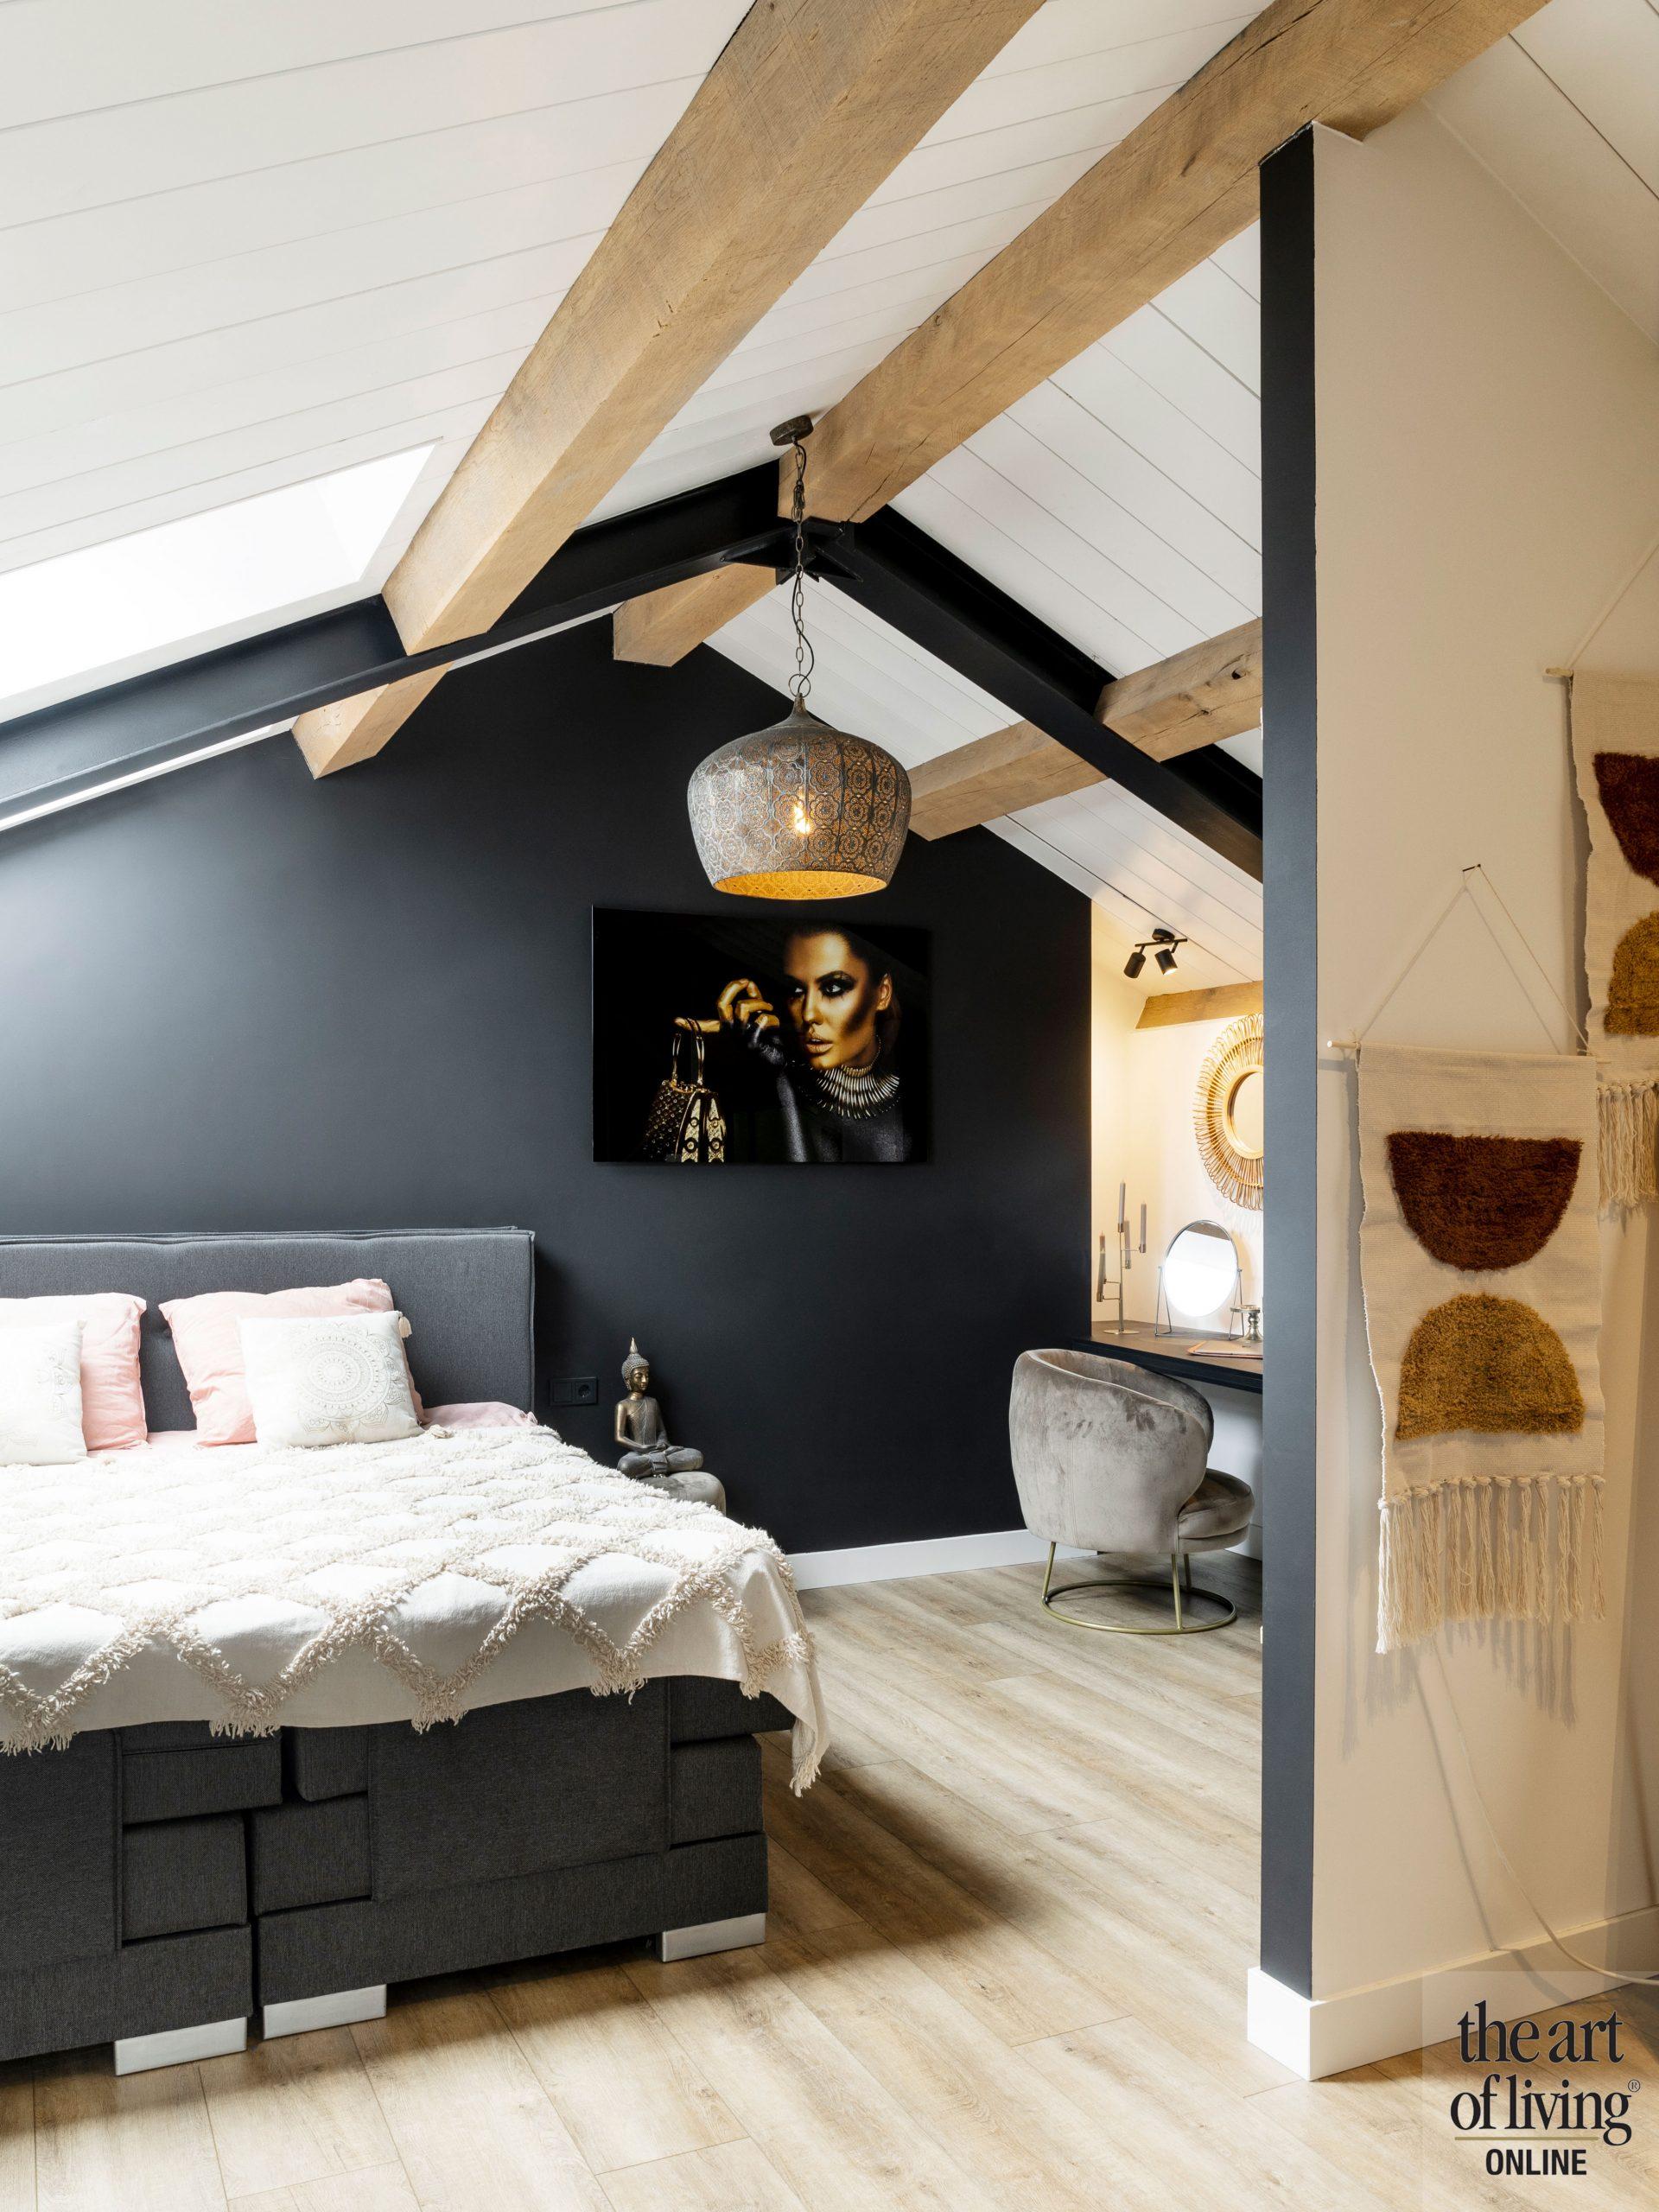 Boederijwoning | Arend Groenewegen woning Prinsenbeek, the art of living